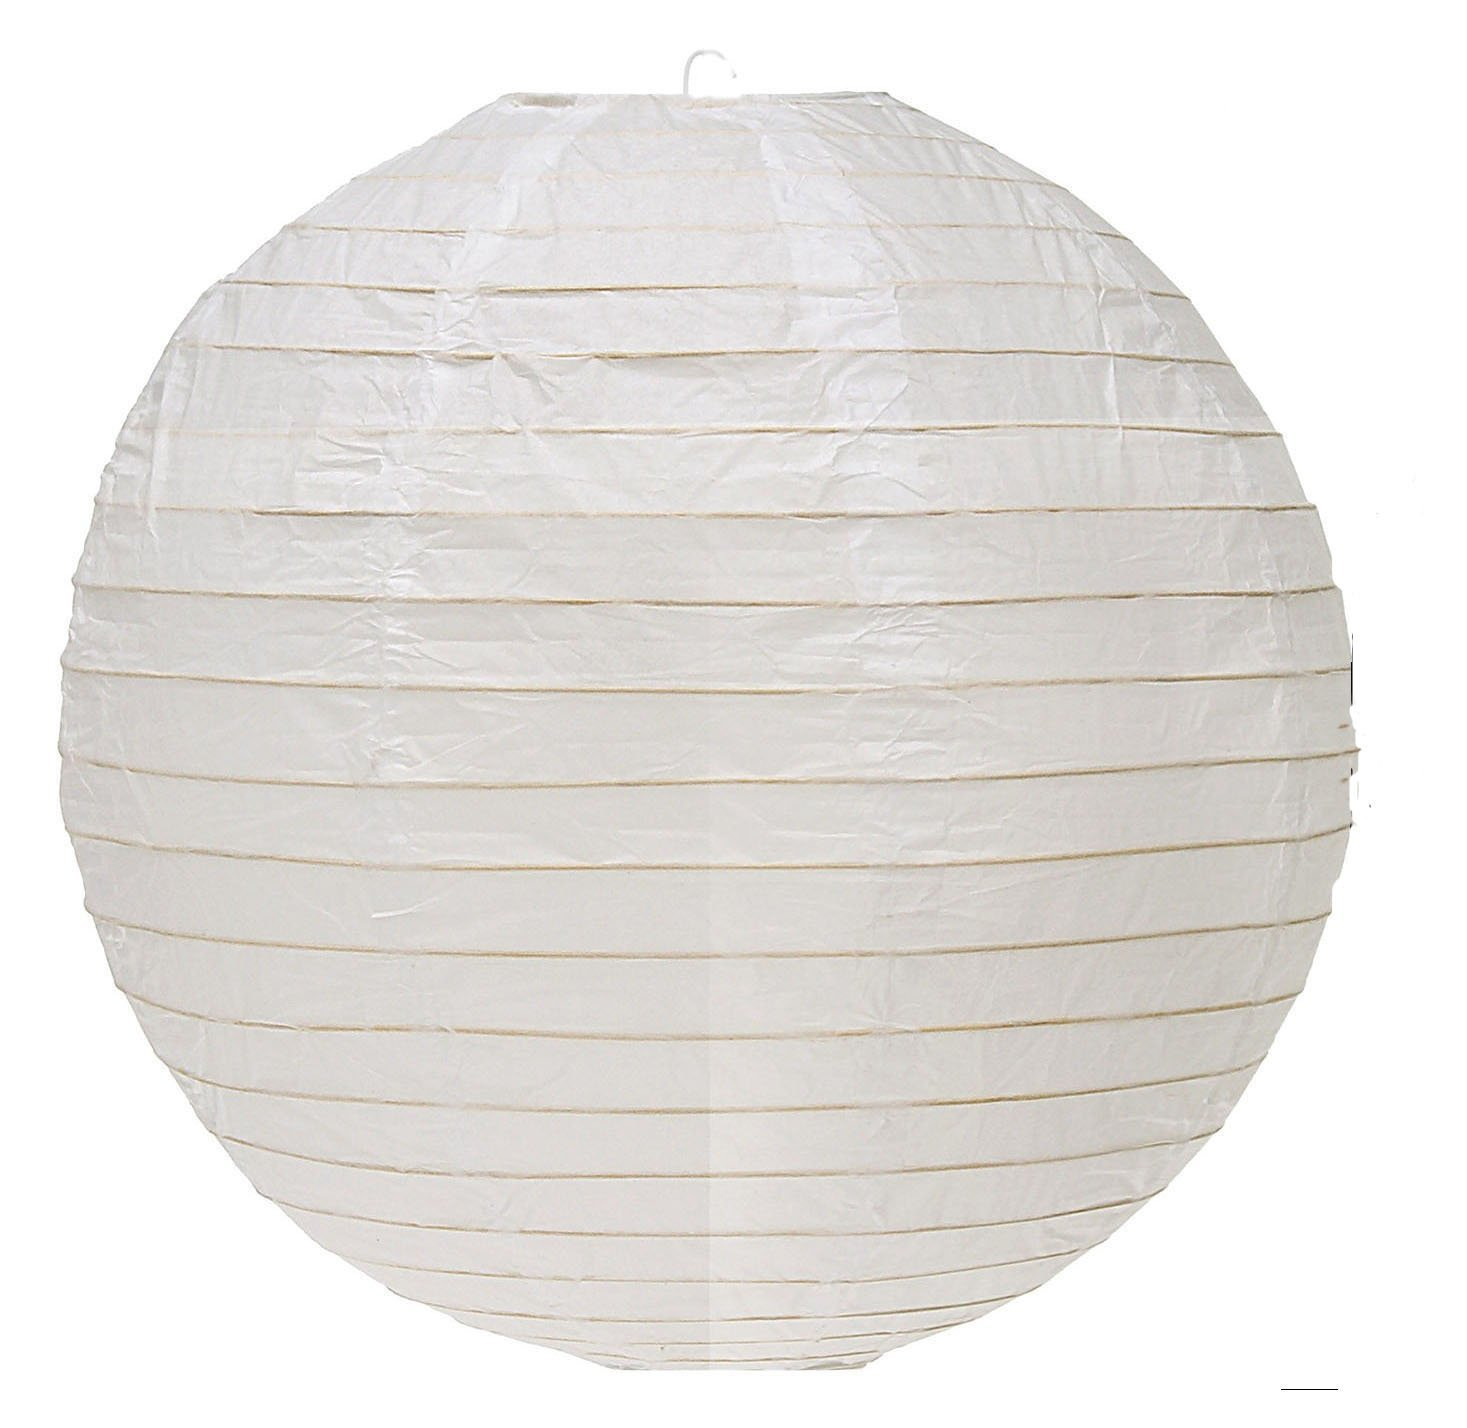 "12 pack 12"" Paper Lanterns Lamp Shades Party Supplies - White - Paper Lanterns Wedding - Amazon.com"